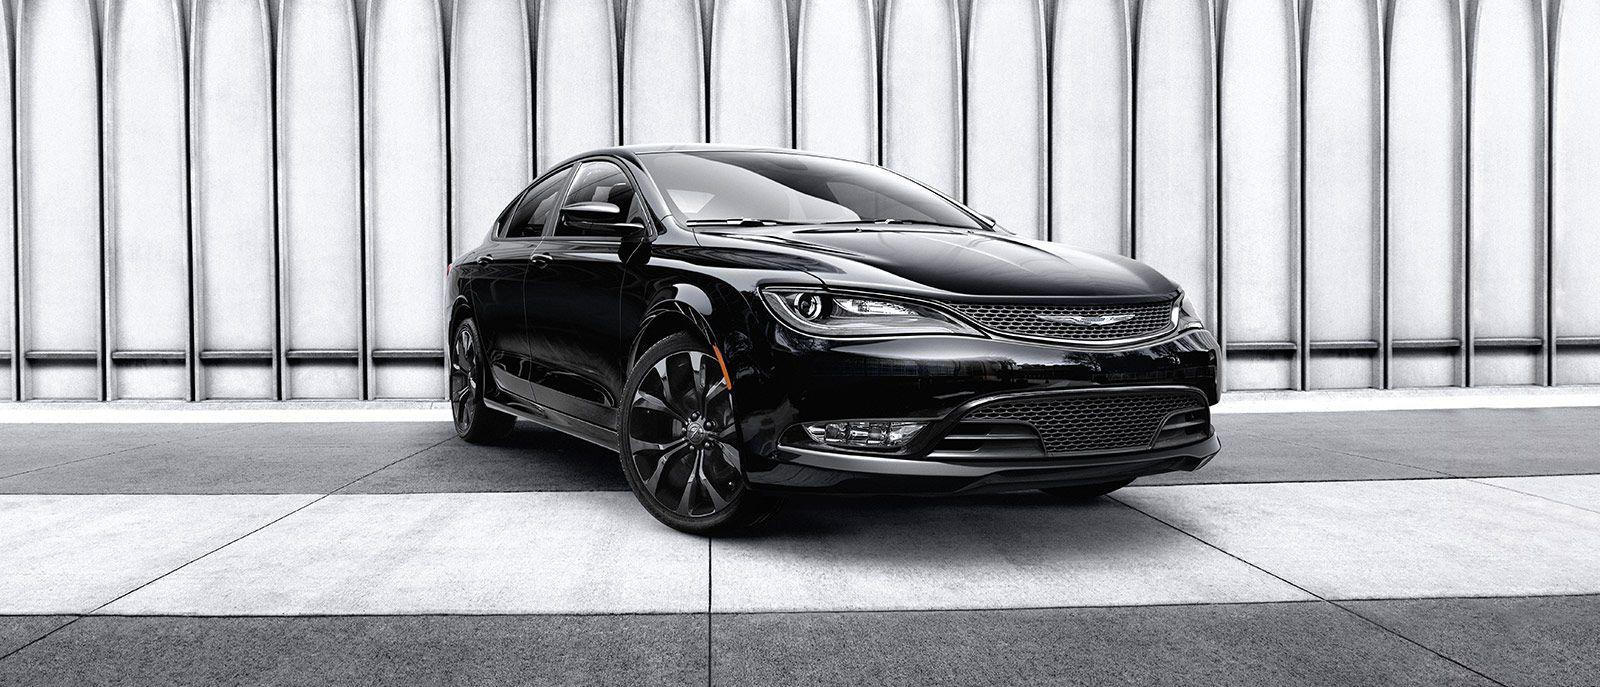 taking with cars all chrysler talking new sedan reaching and honda on image debut chief world upmarket gardner al